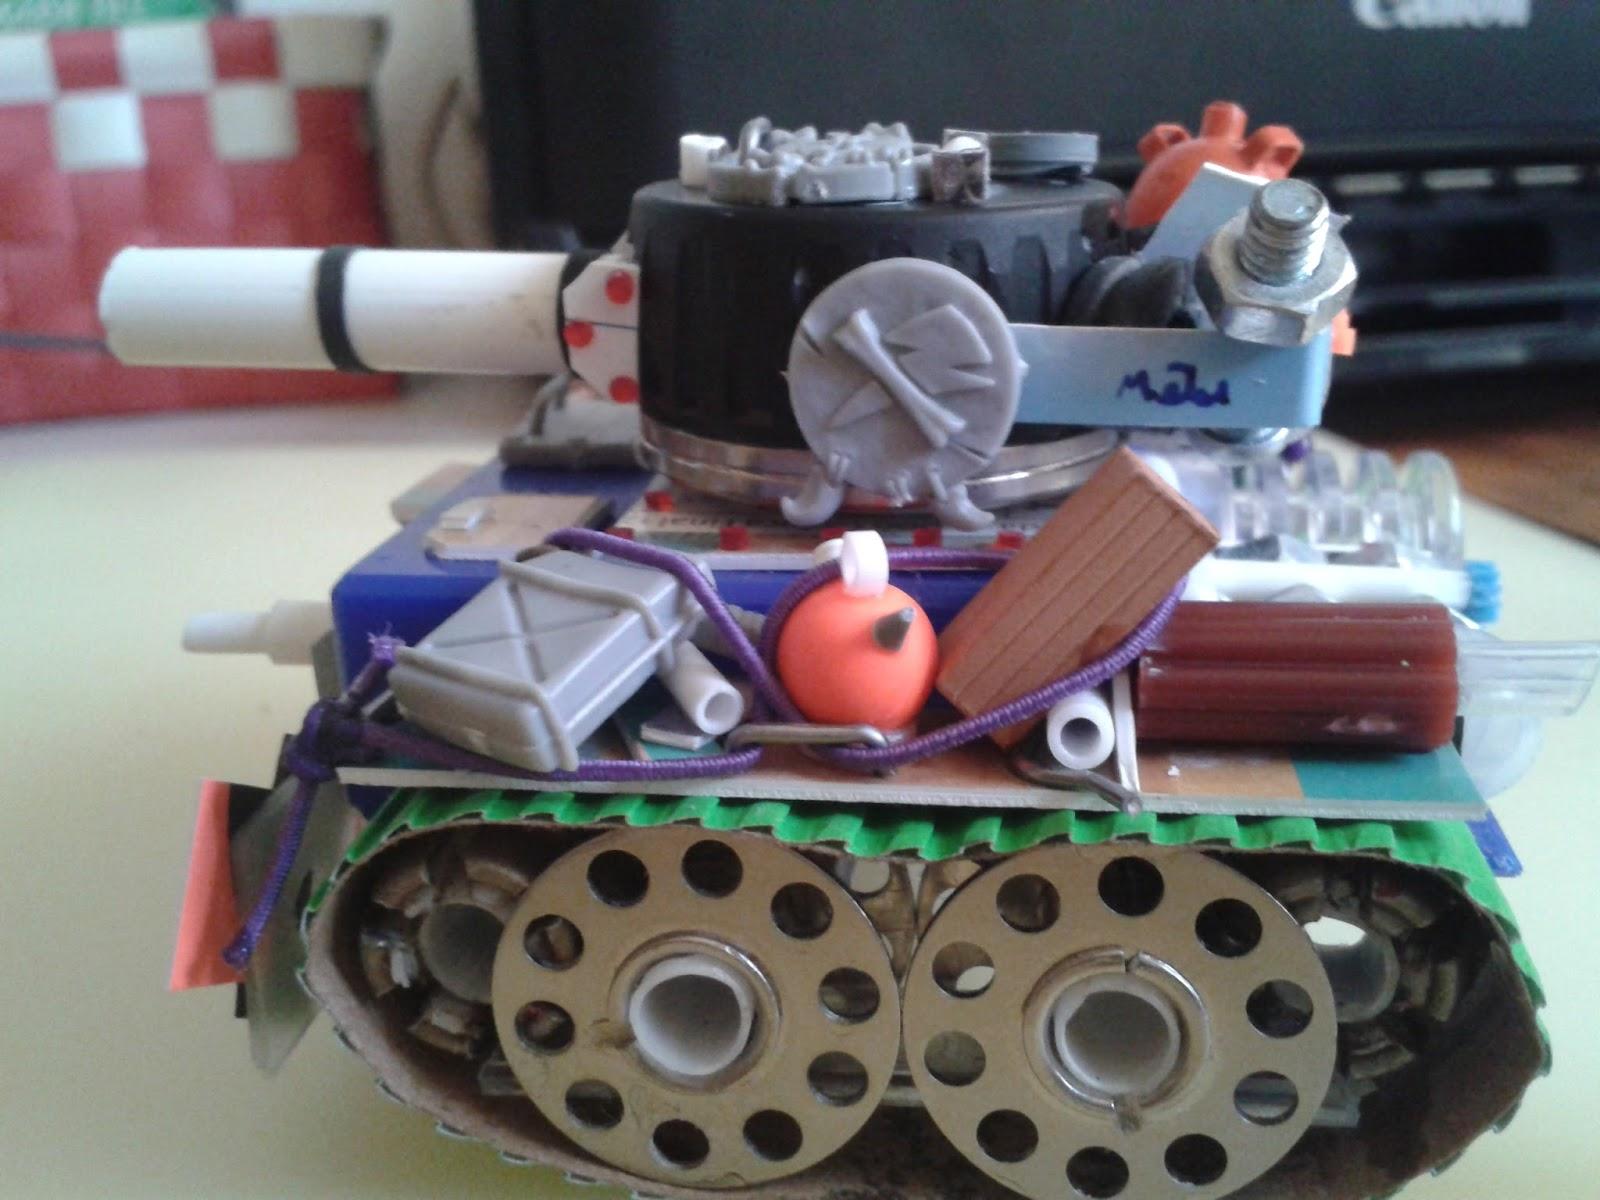 40k: Proyectos Orkos de AKM 20120210_190502